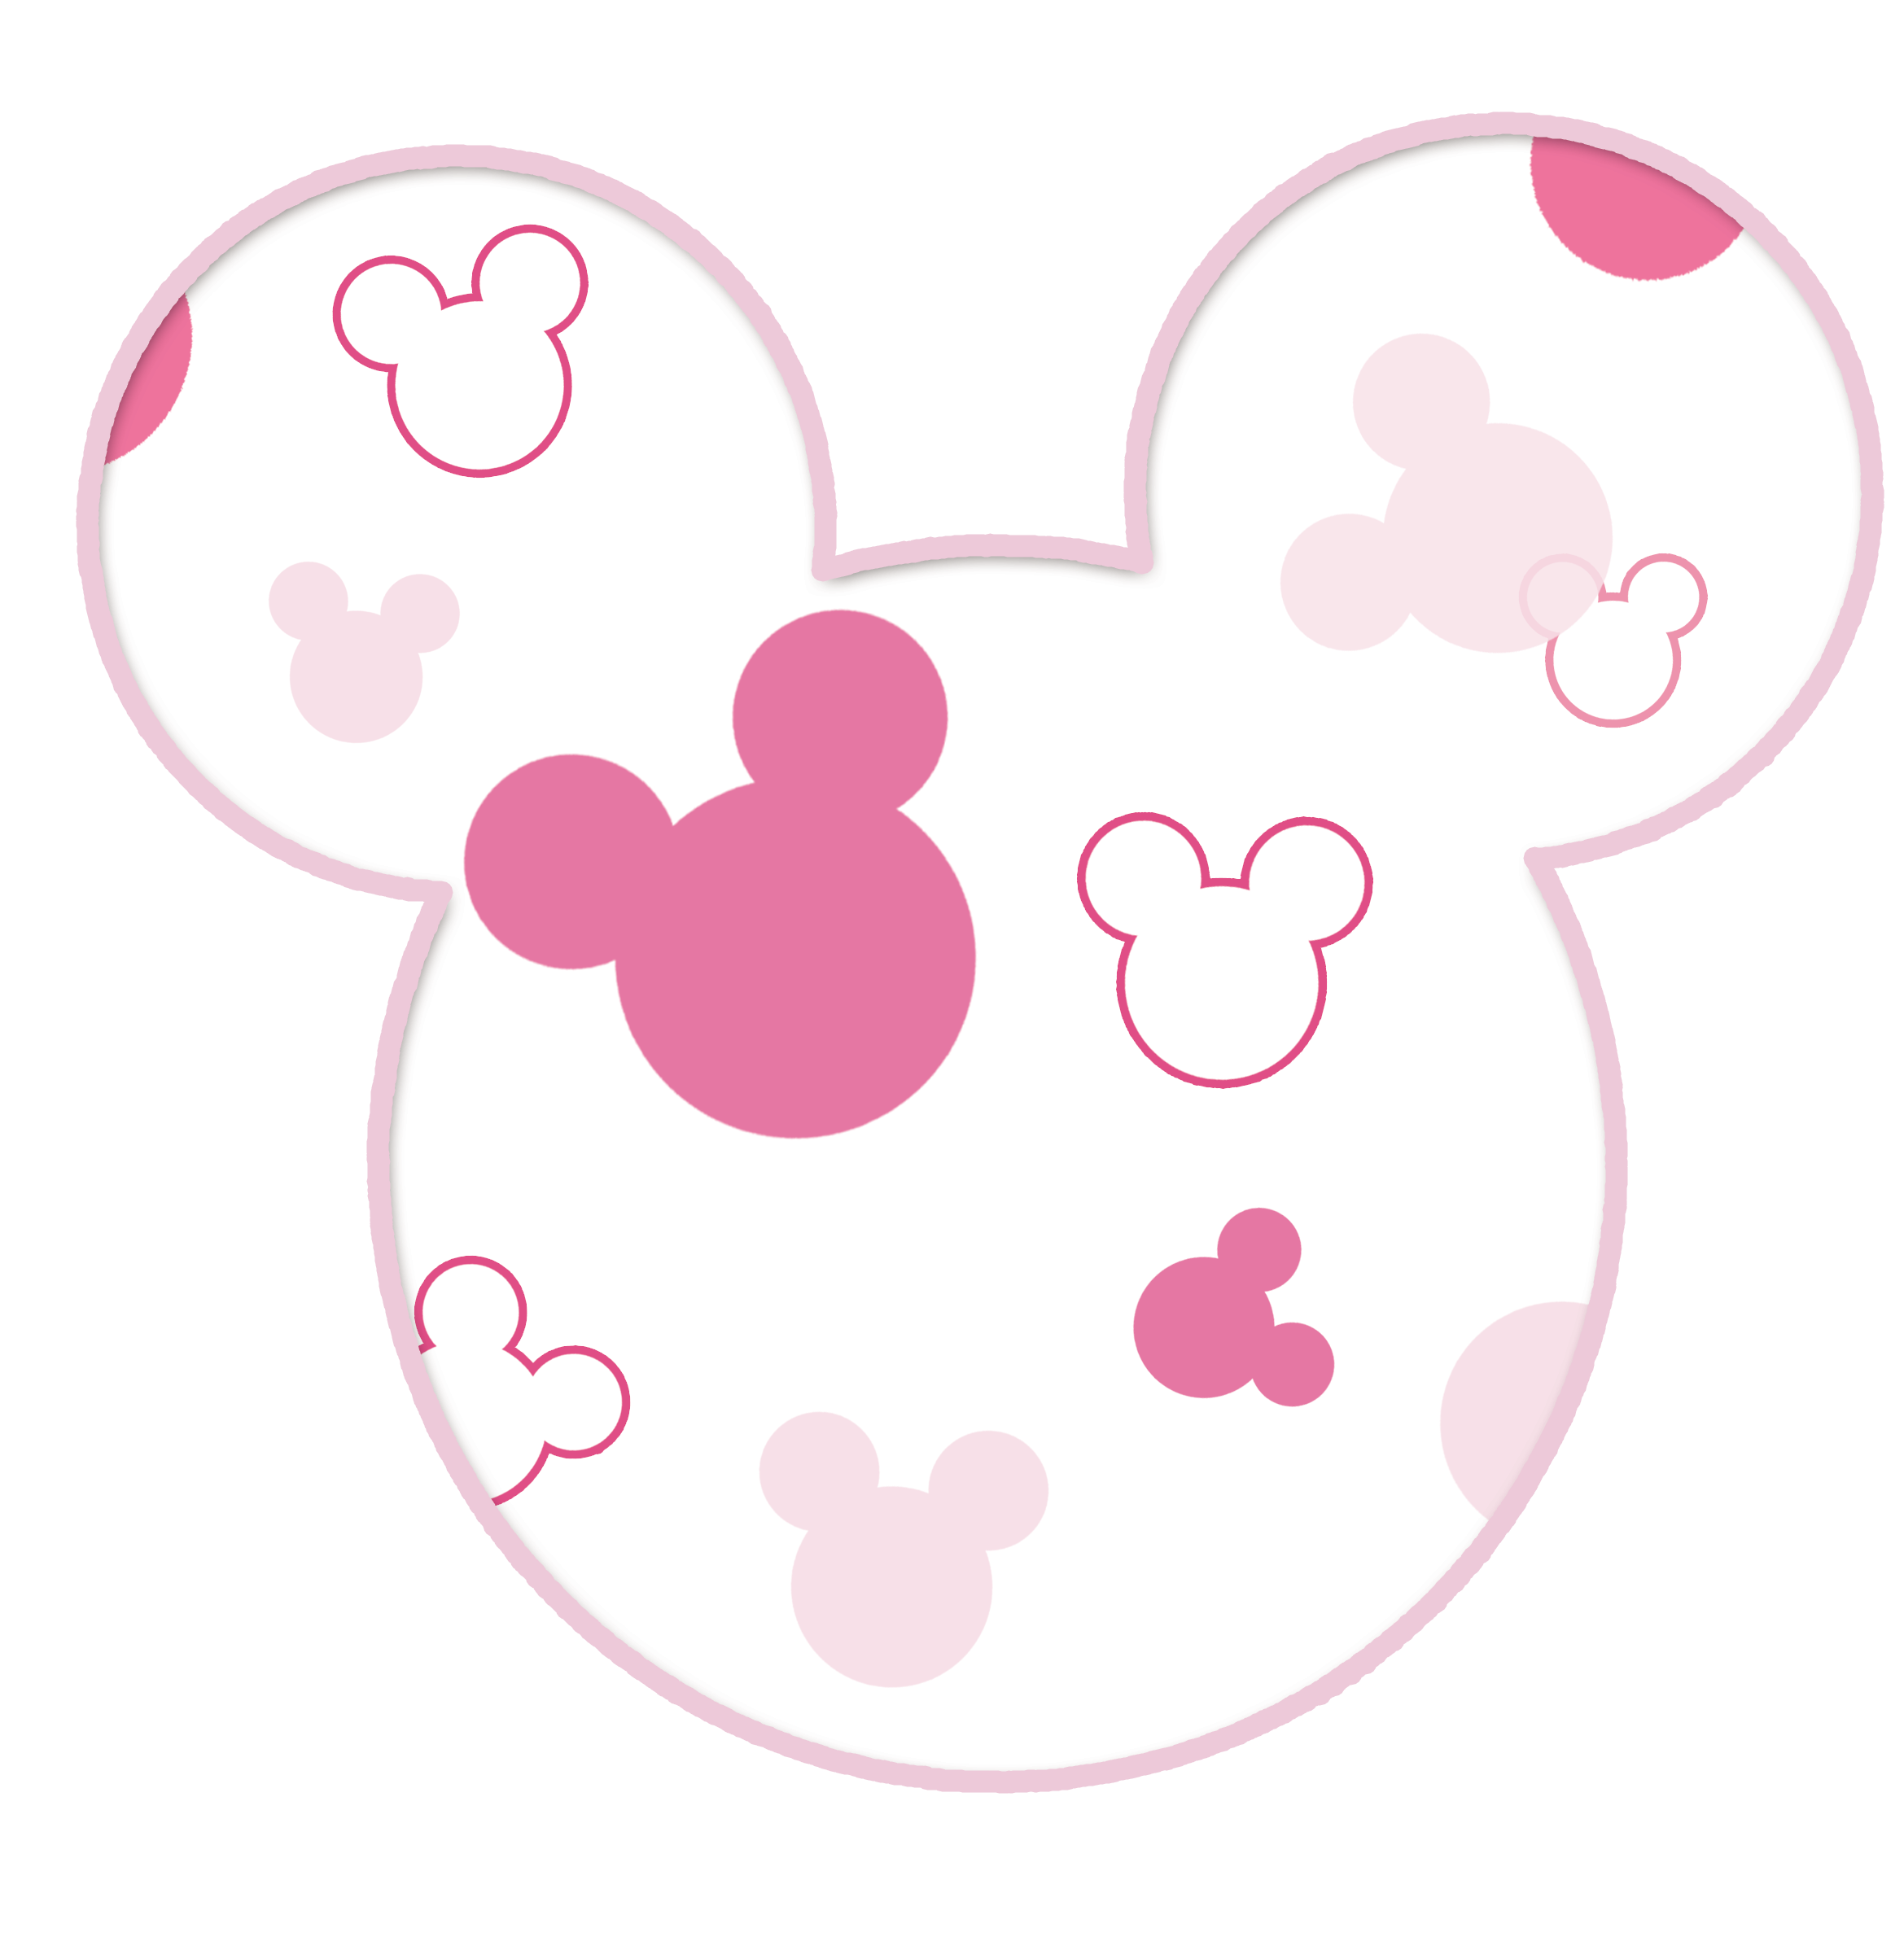 Disney clipart heart. Pin by brandy gleim